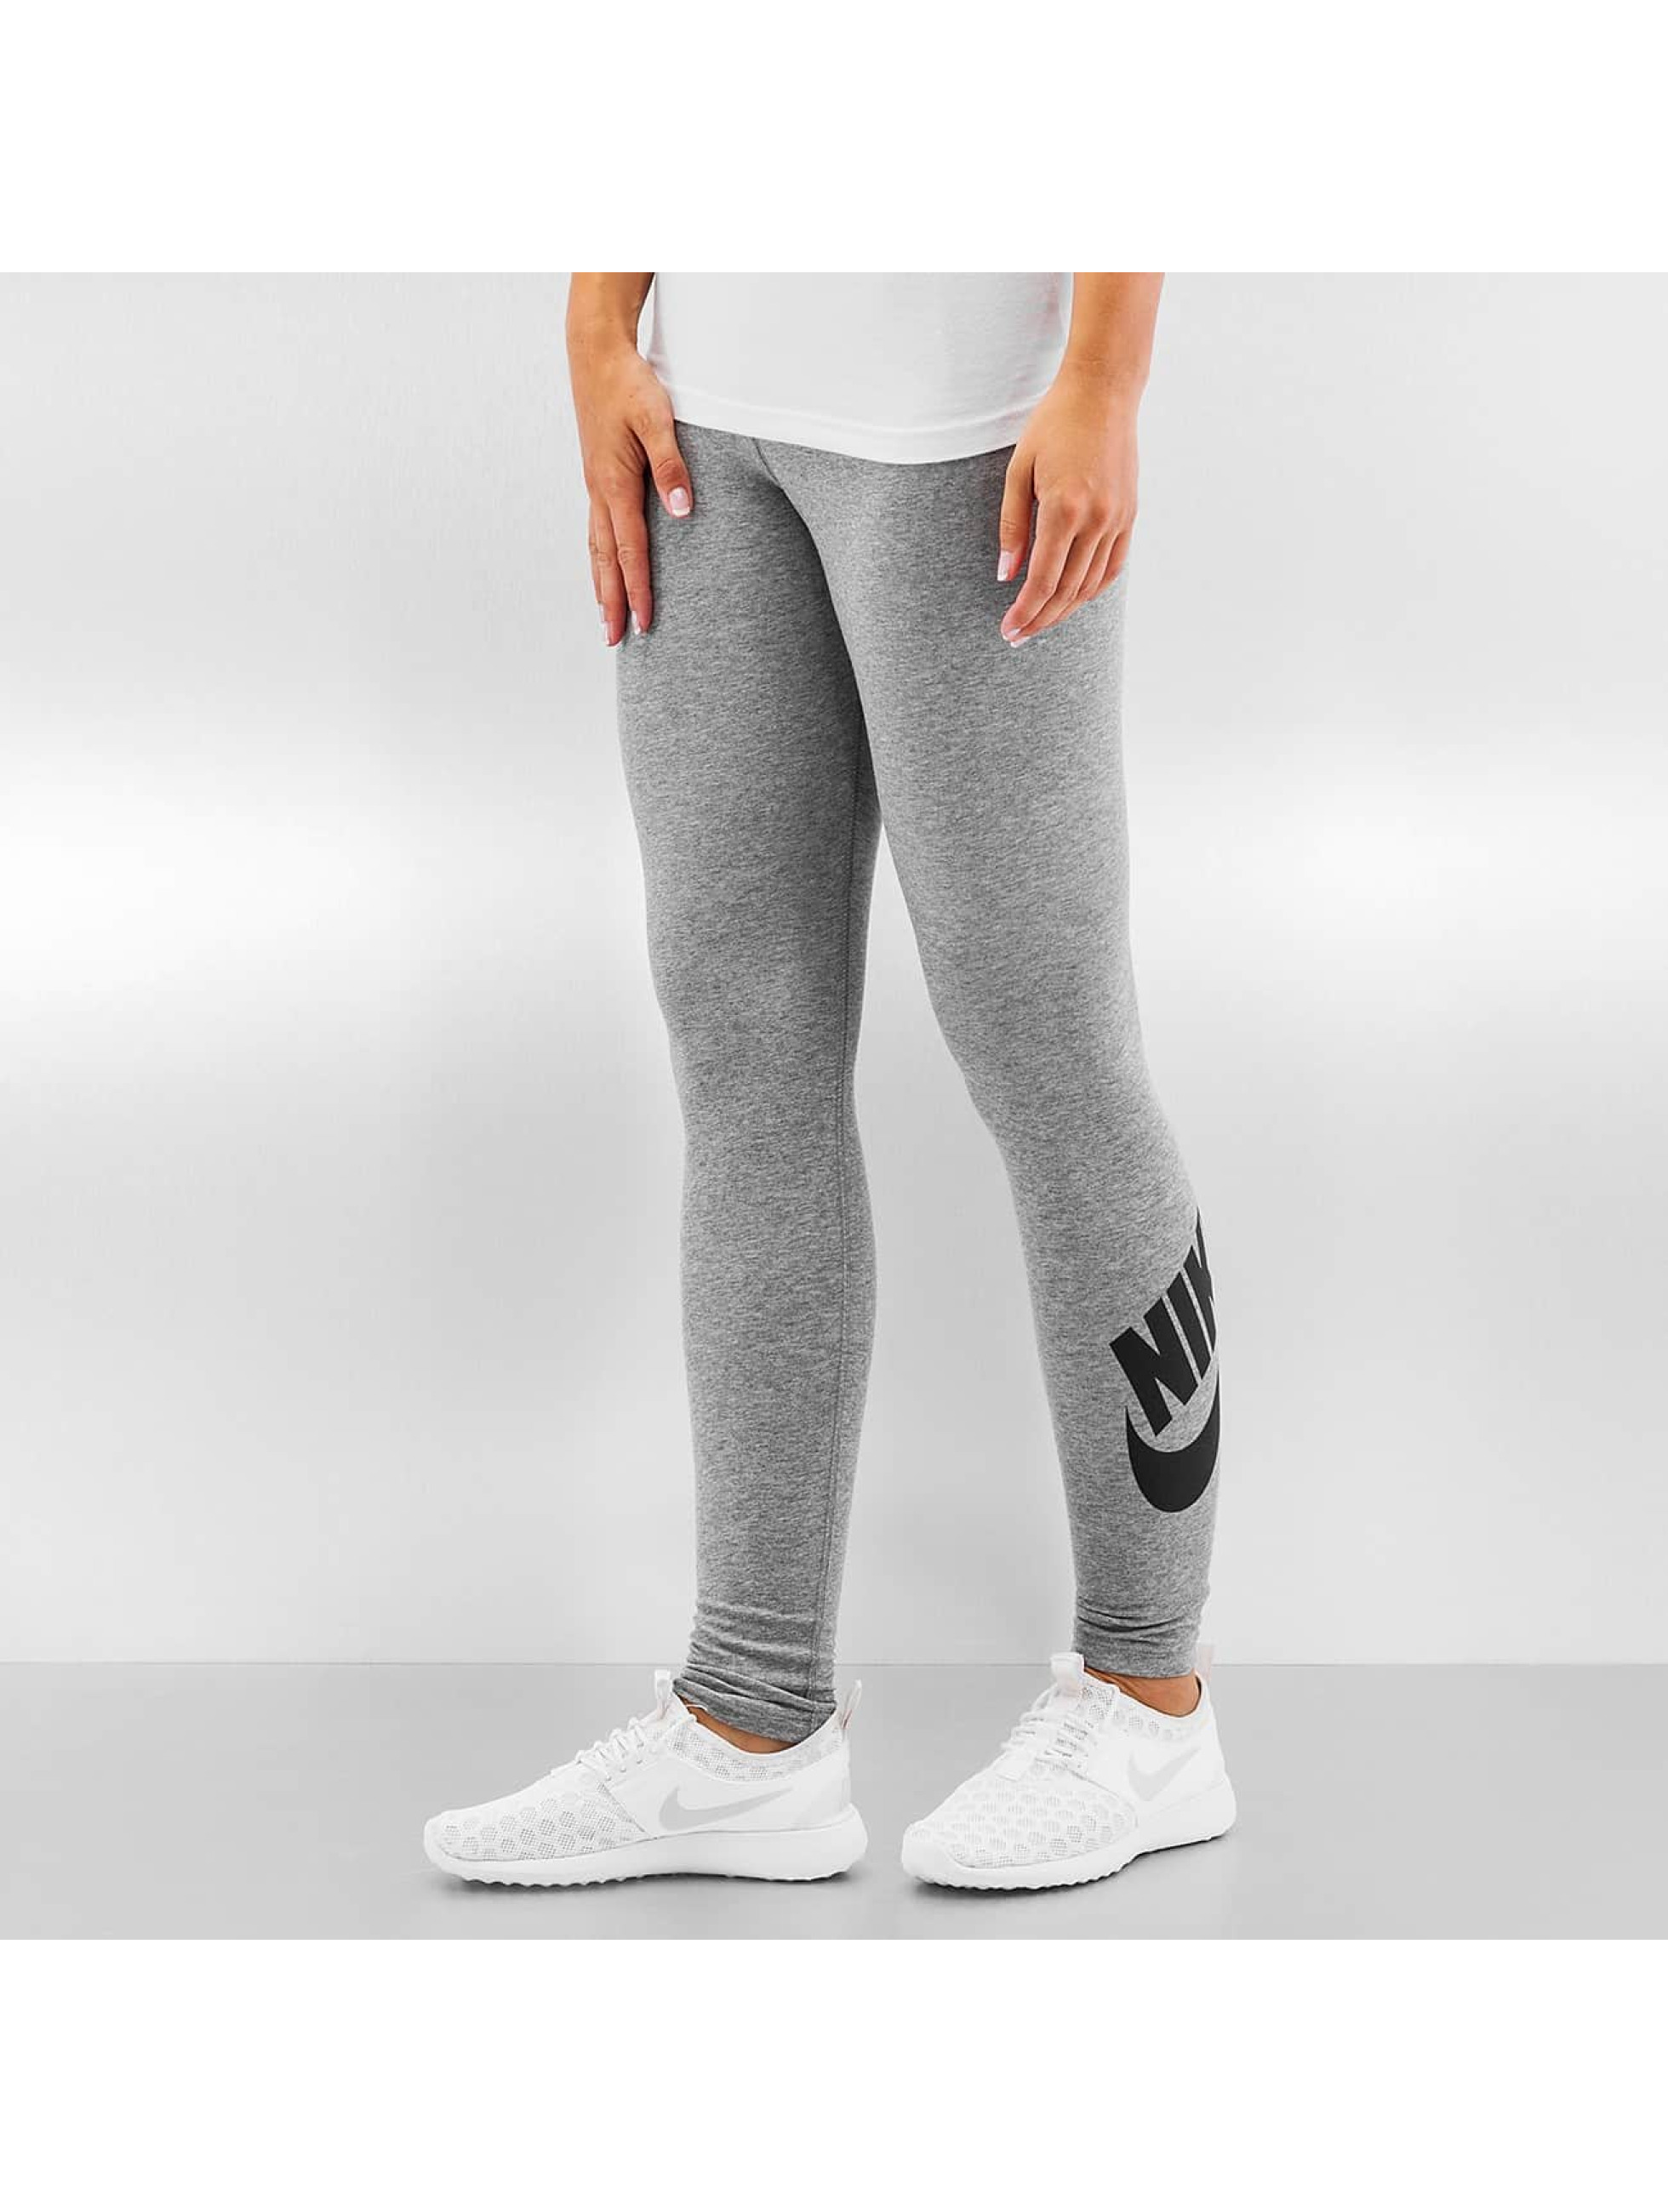 Nike Legging Leg-A-See Logo grau